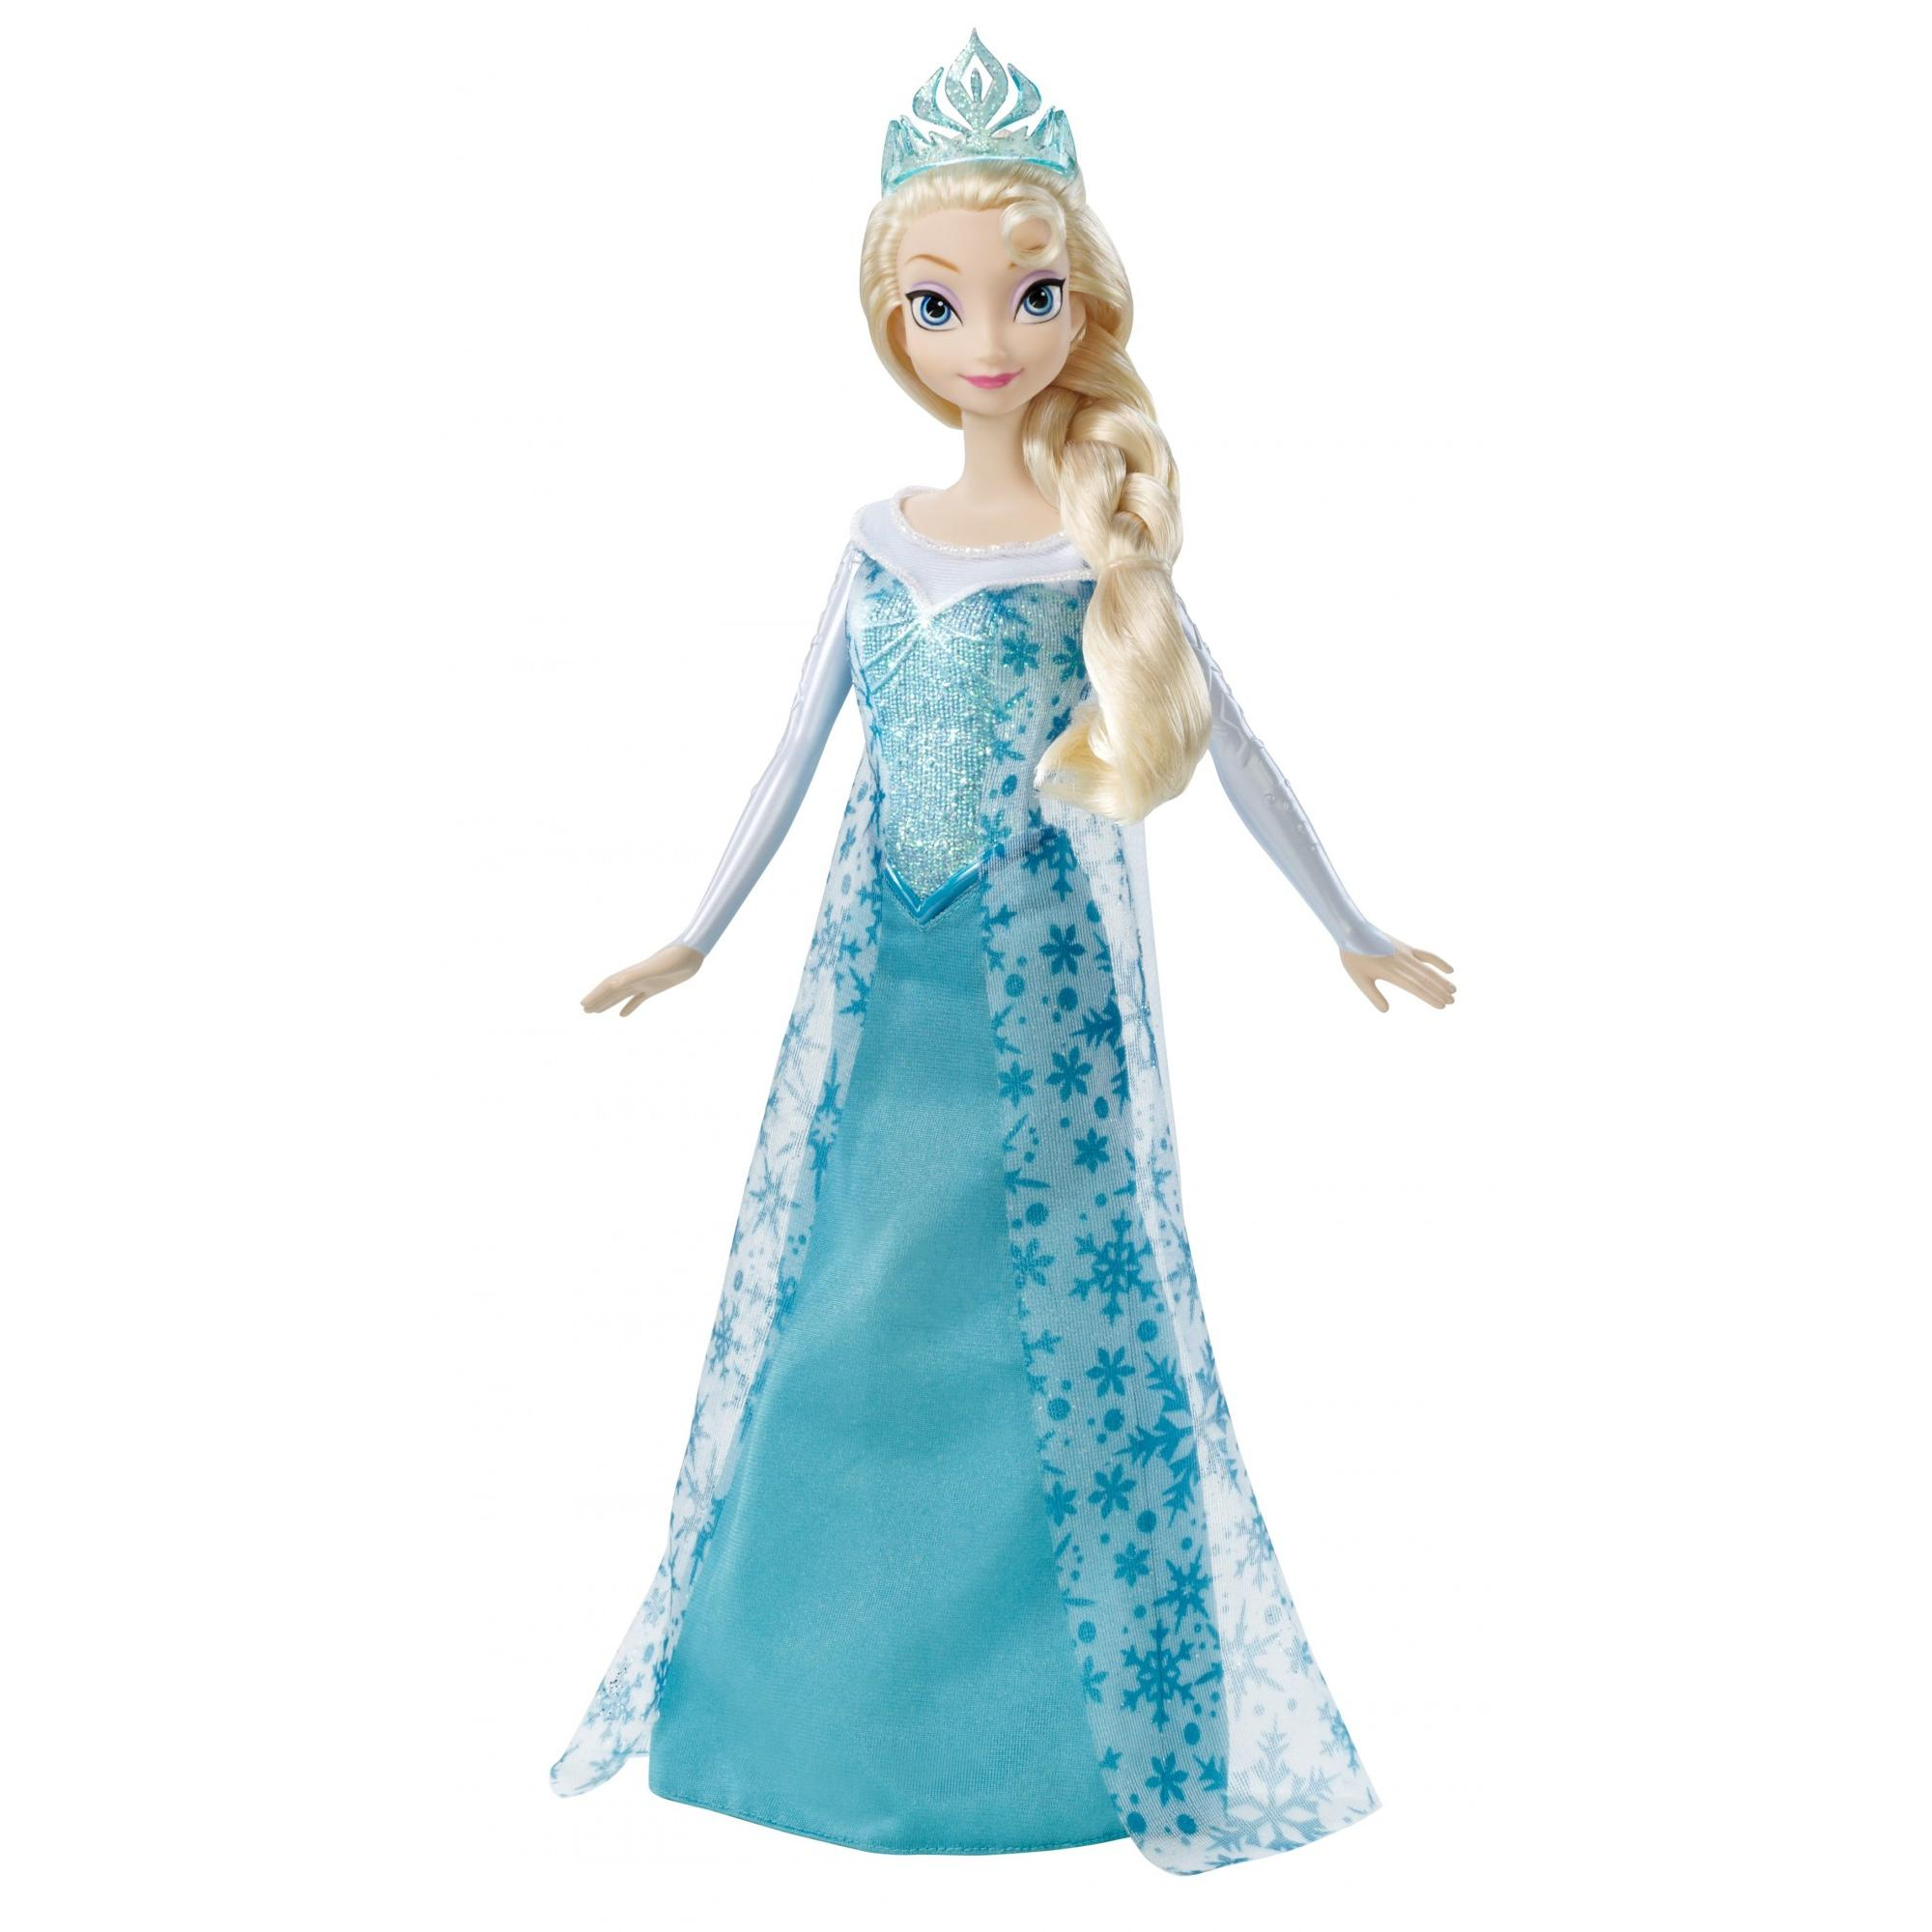 Disney Frozen Sparkle Elsa Doll by Mattel